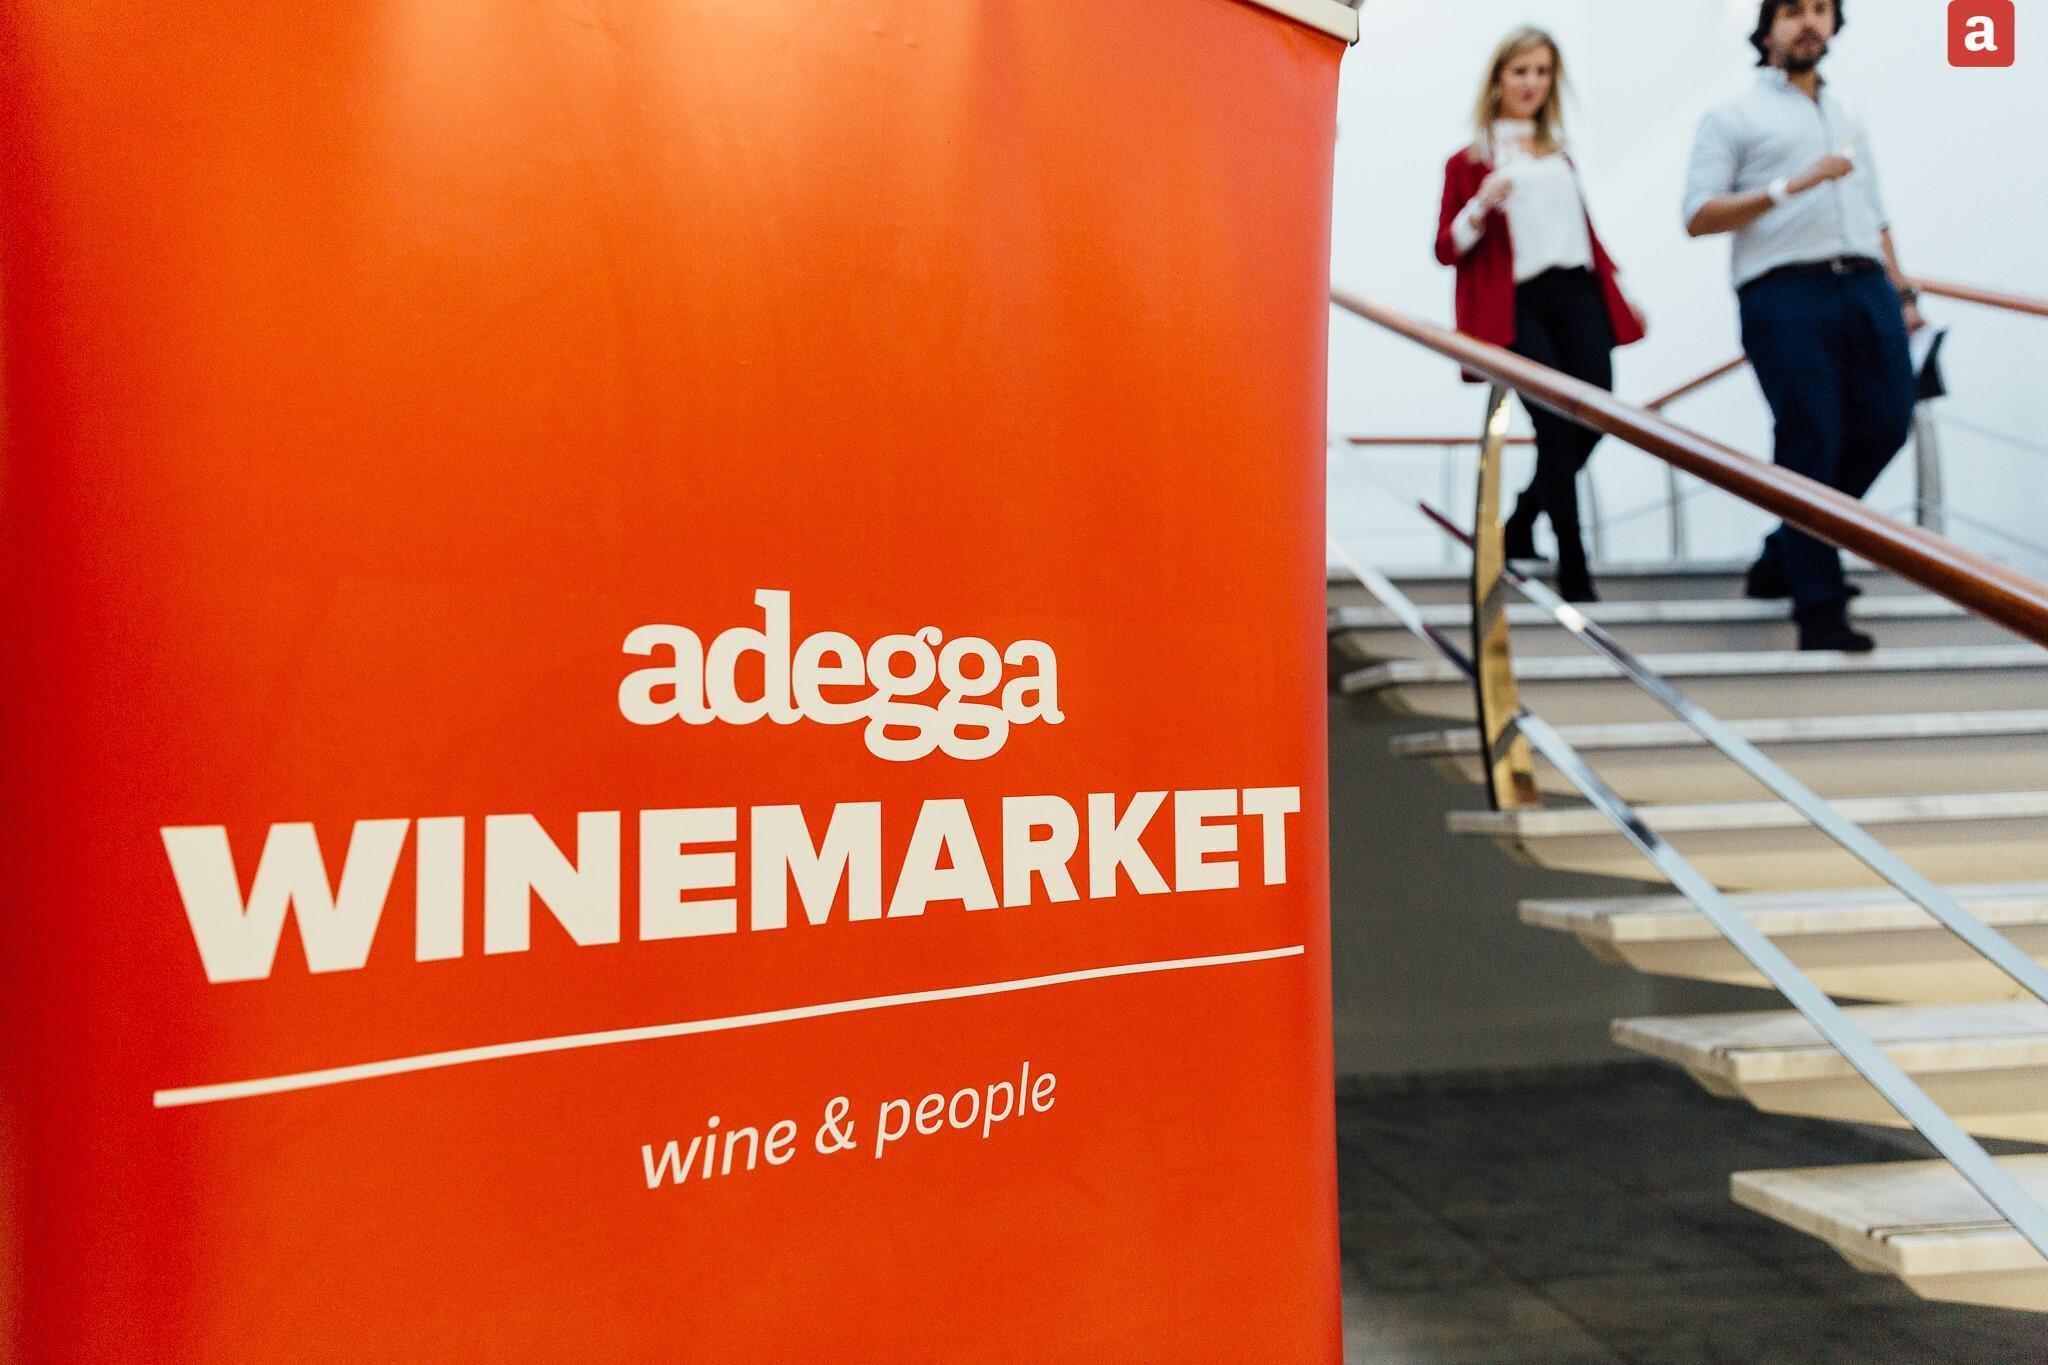 adegga-winemarket-porto-2018